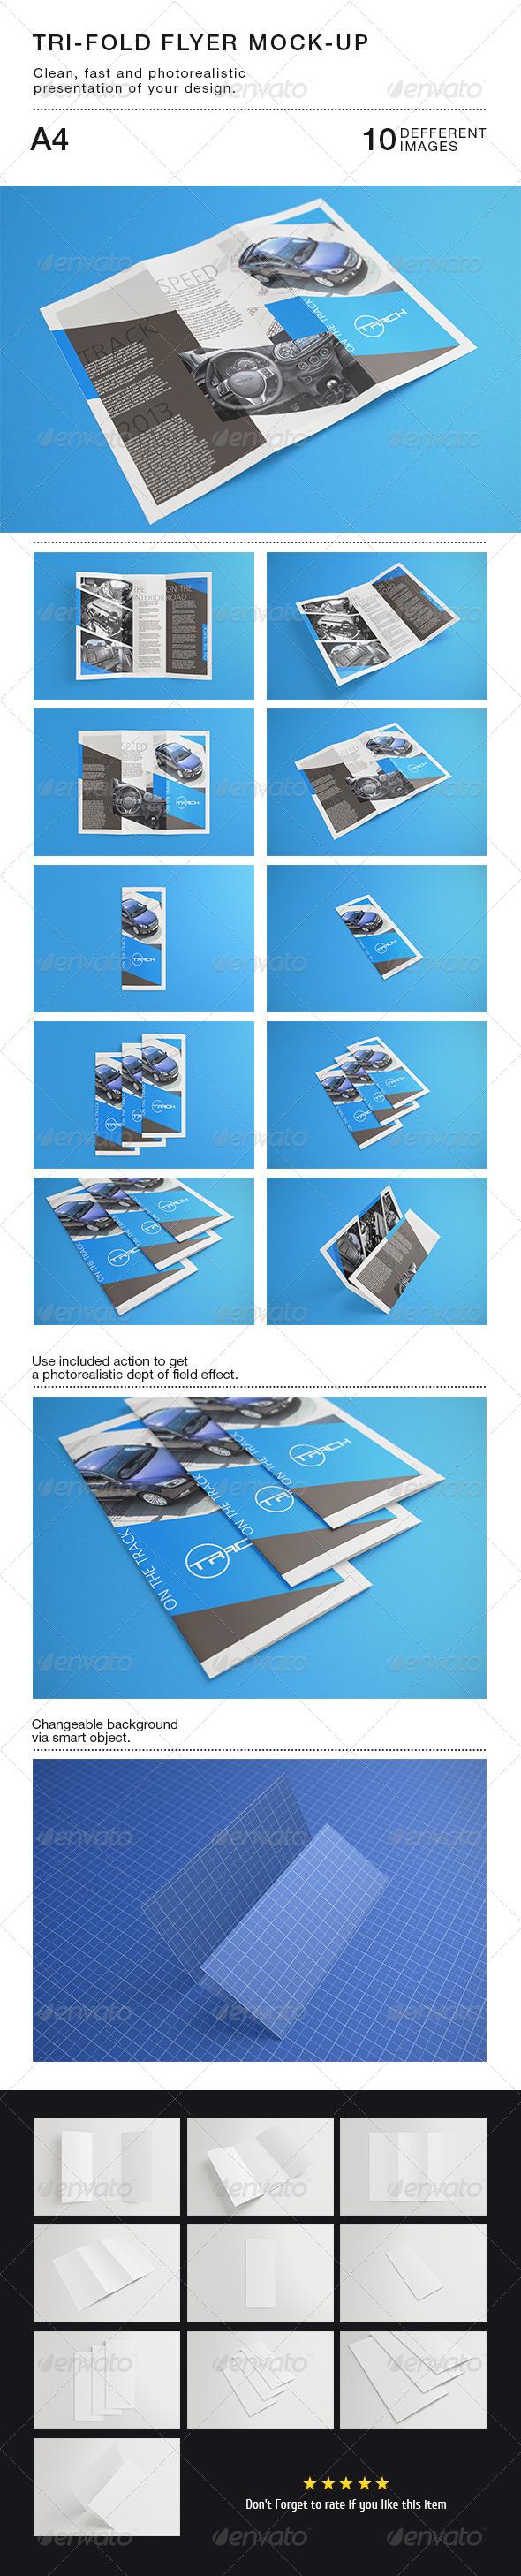 Tri-fold Flyer A4 Mock-Up - Brochures Print